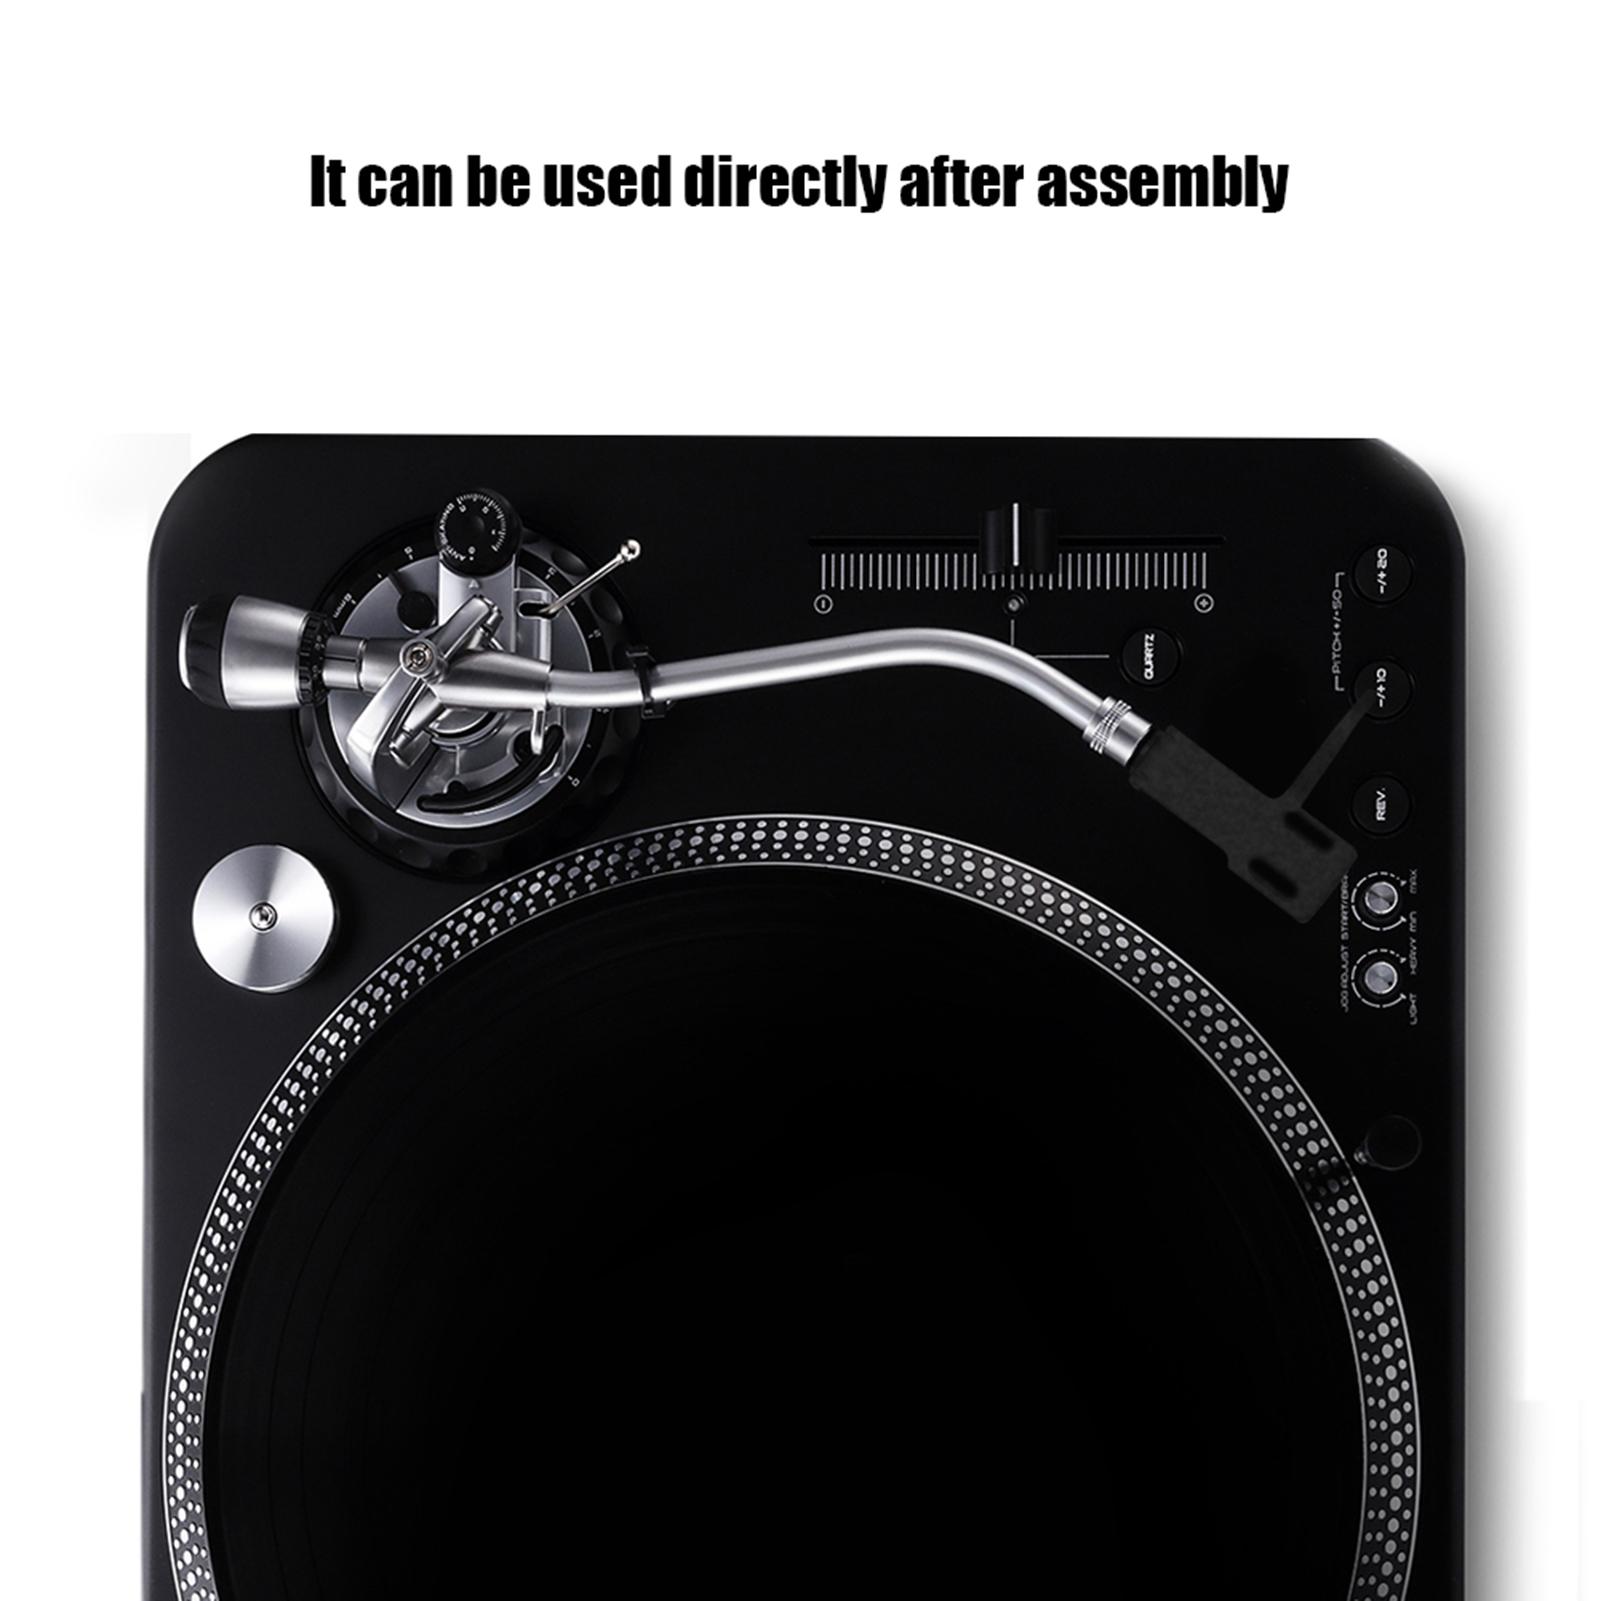 Universal-Phono-Stylus-Holder-Headshell-Cartridge-Keeper-for-LP-Record-Player thumbnail 35